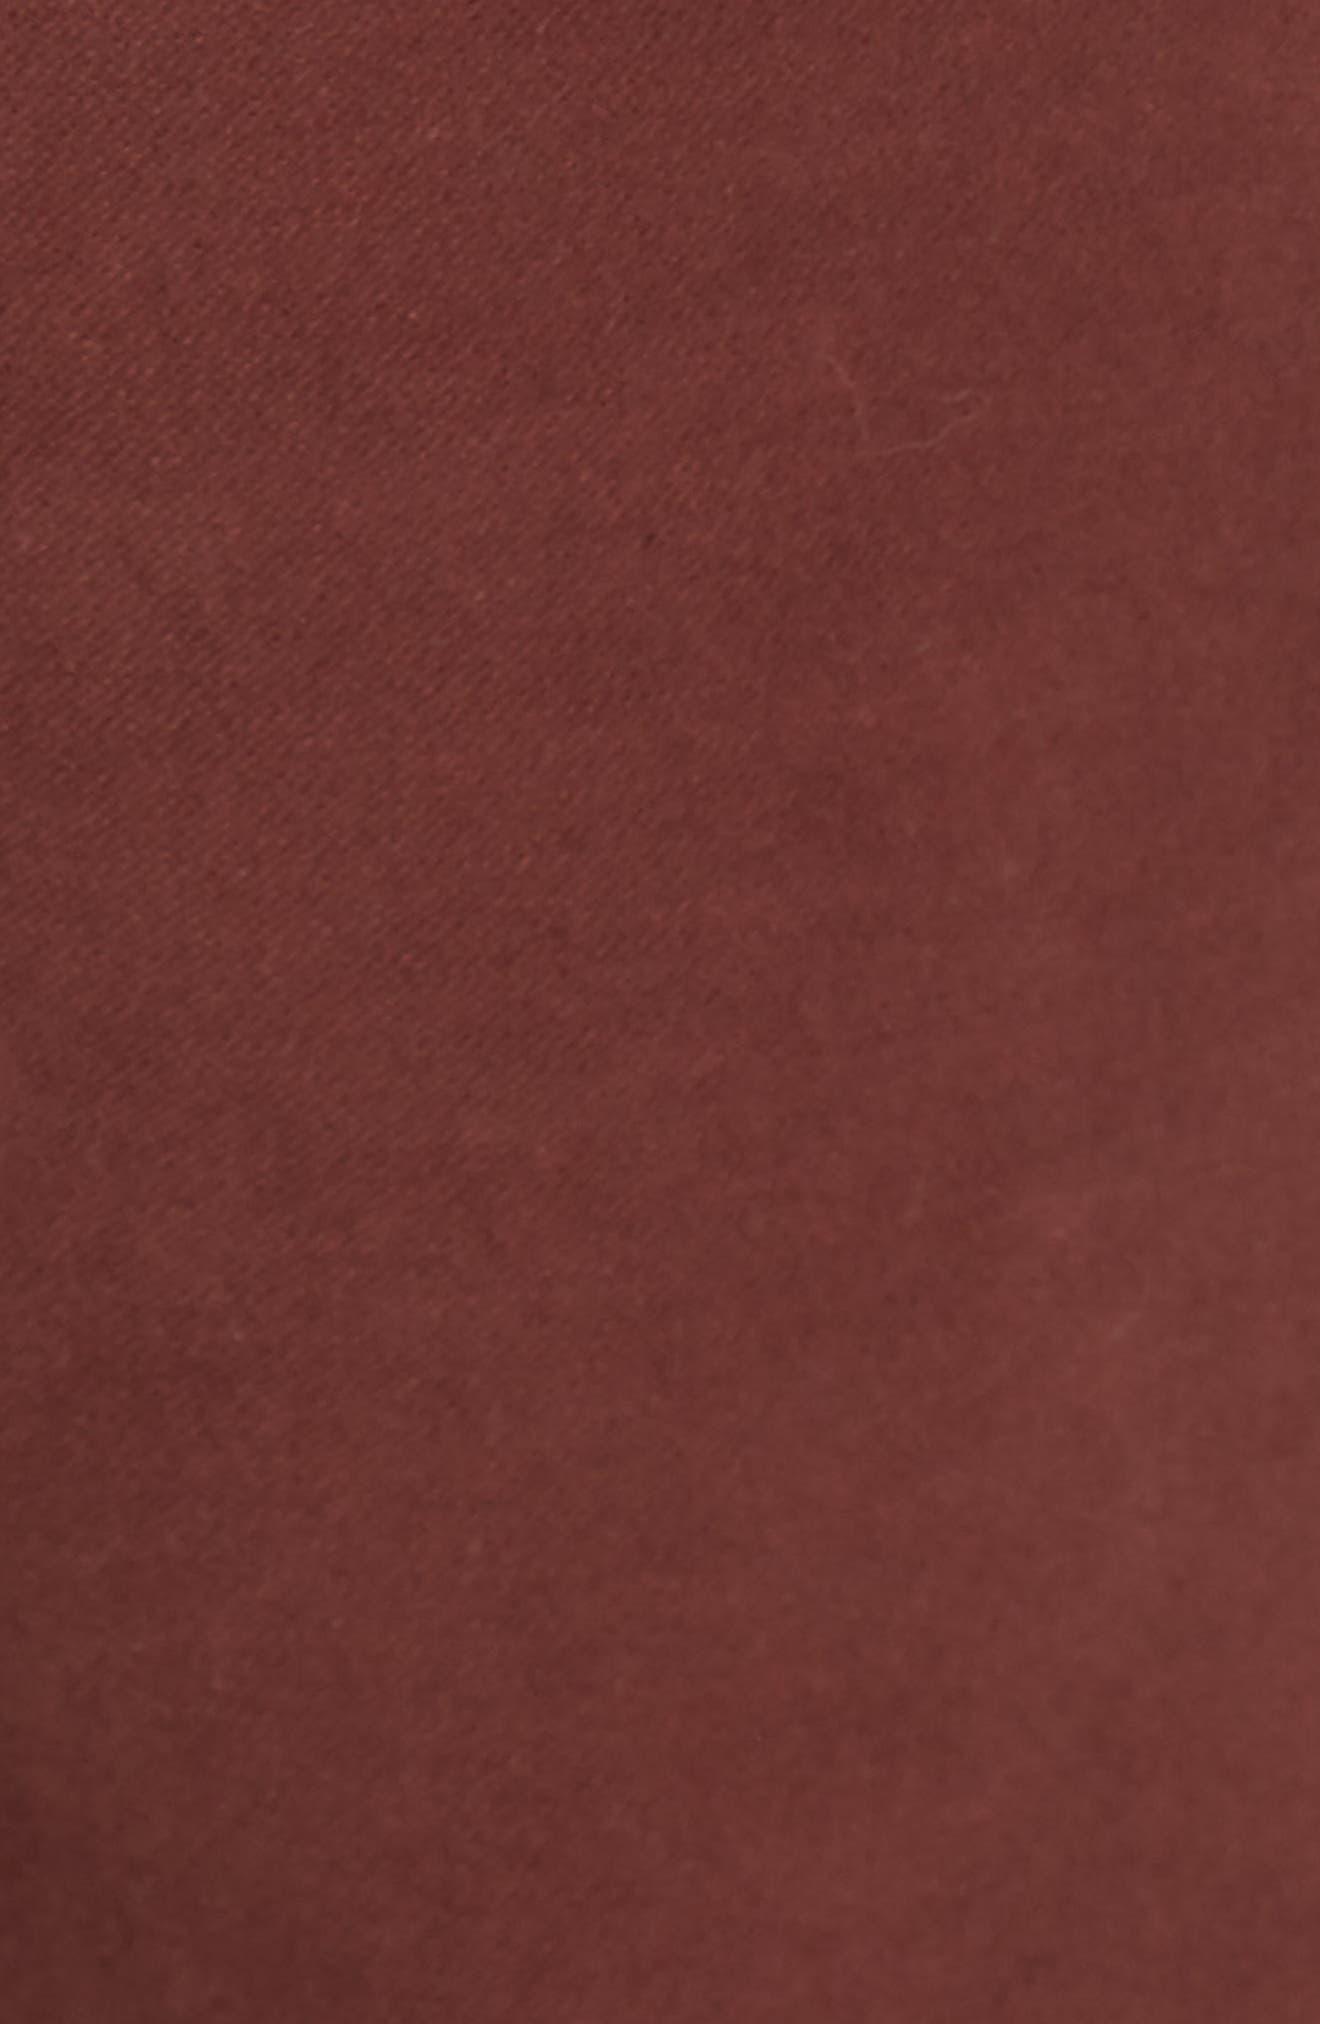 Slim Fit Stretch Cotton Five Pocket Trousers,                             Alternate thumbnail 5, color,                             OCHRE